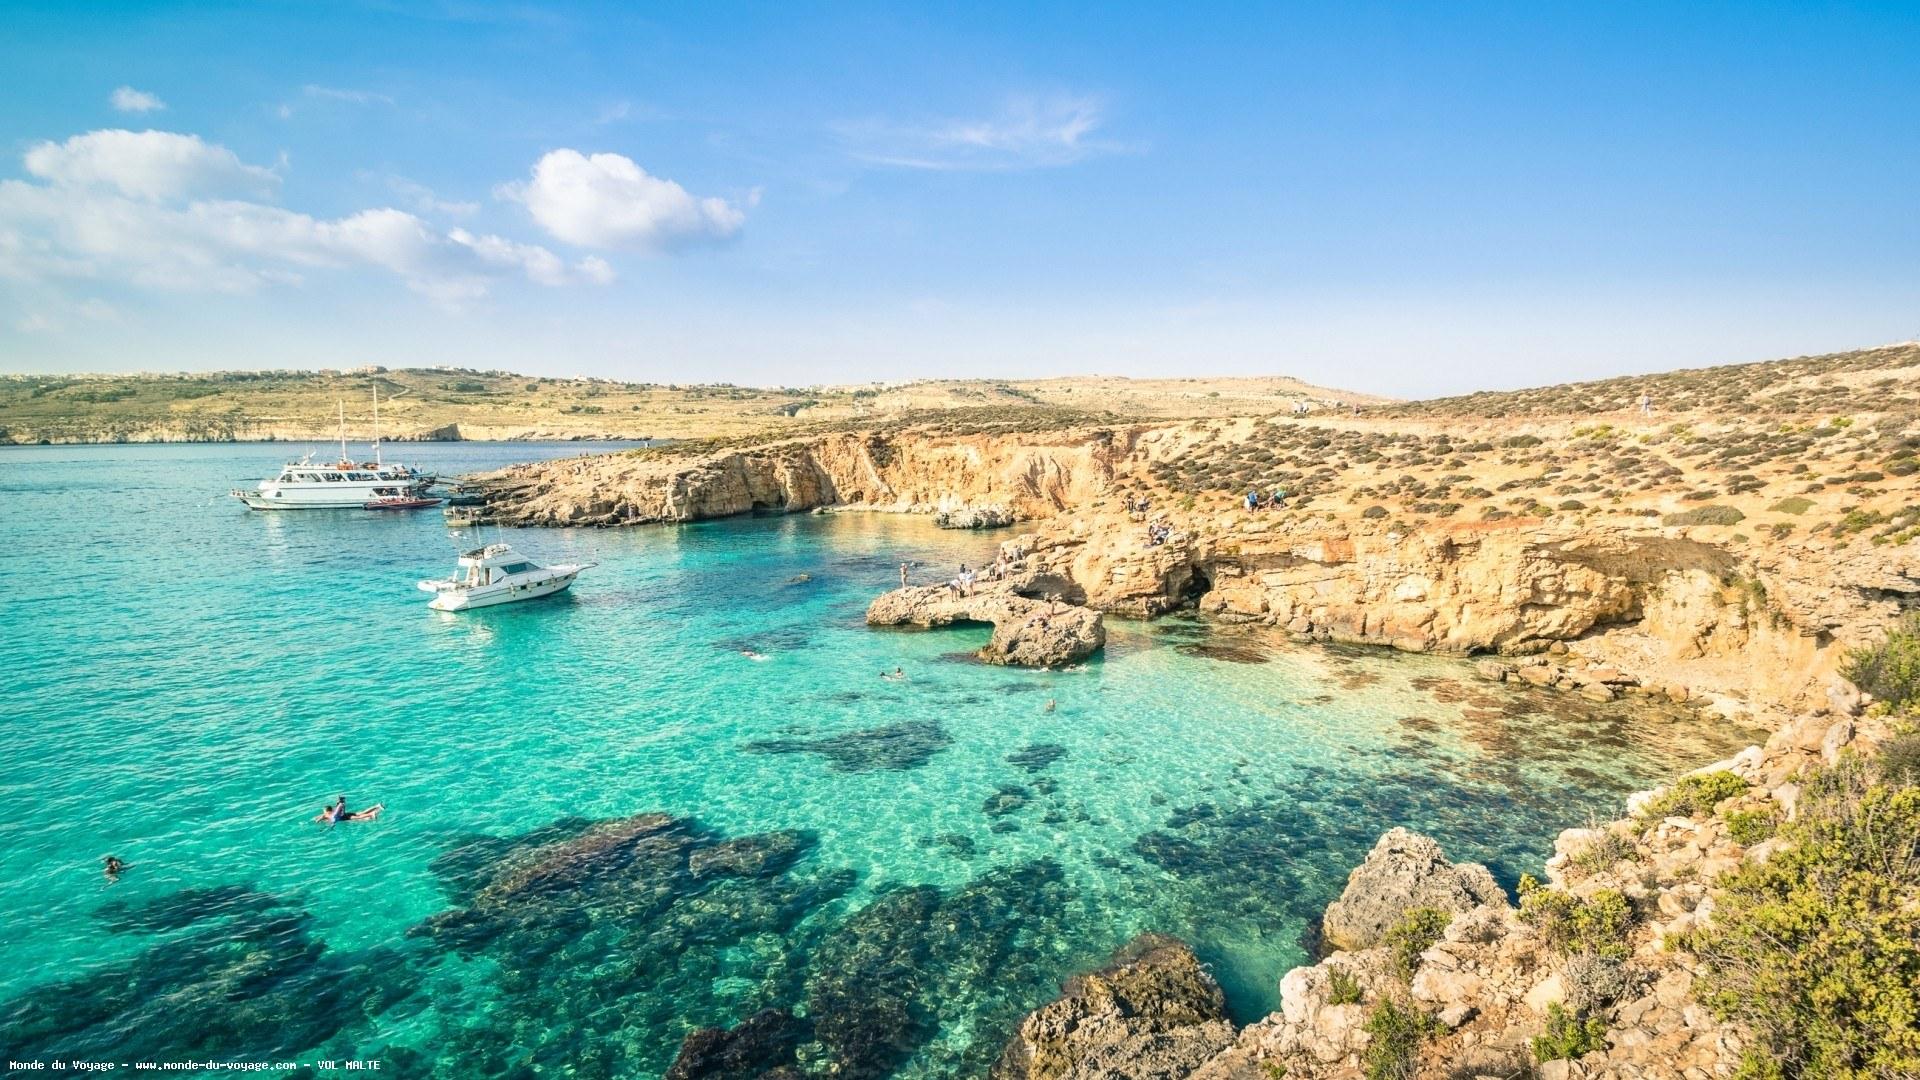 tourisme à malte 2